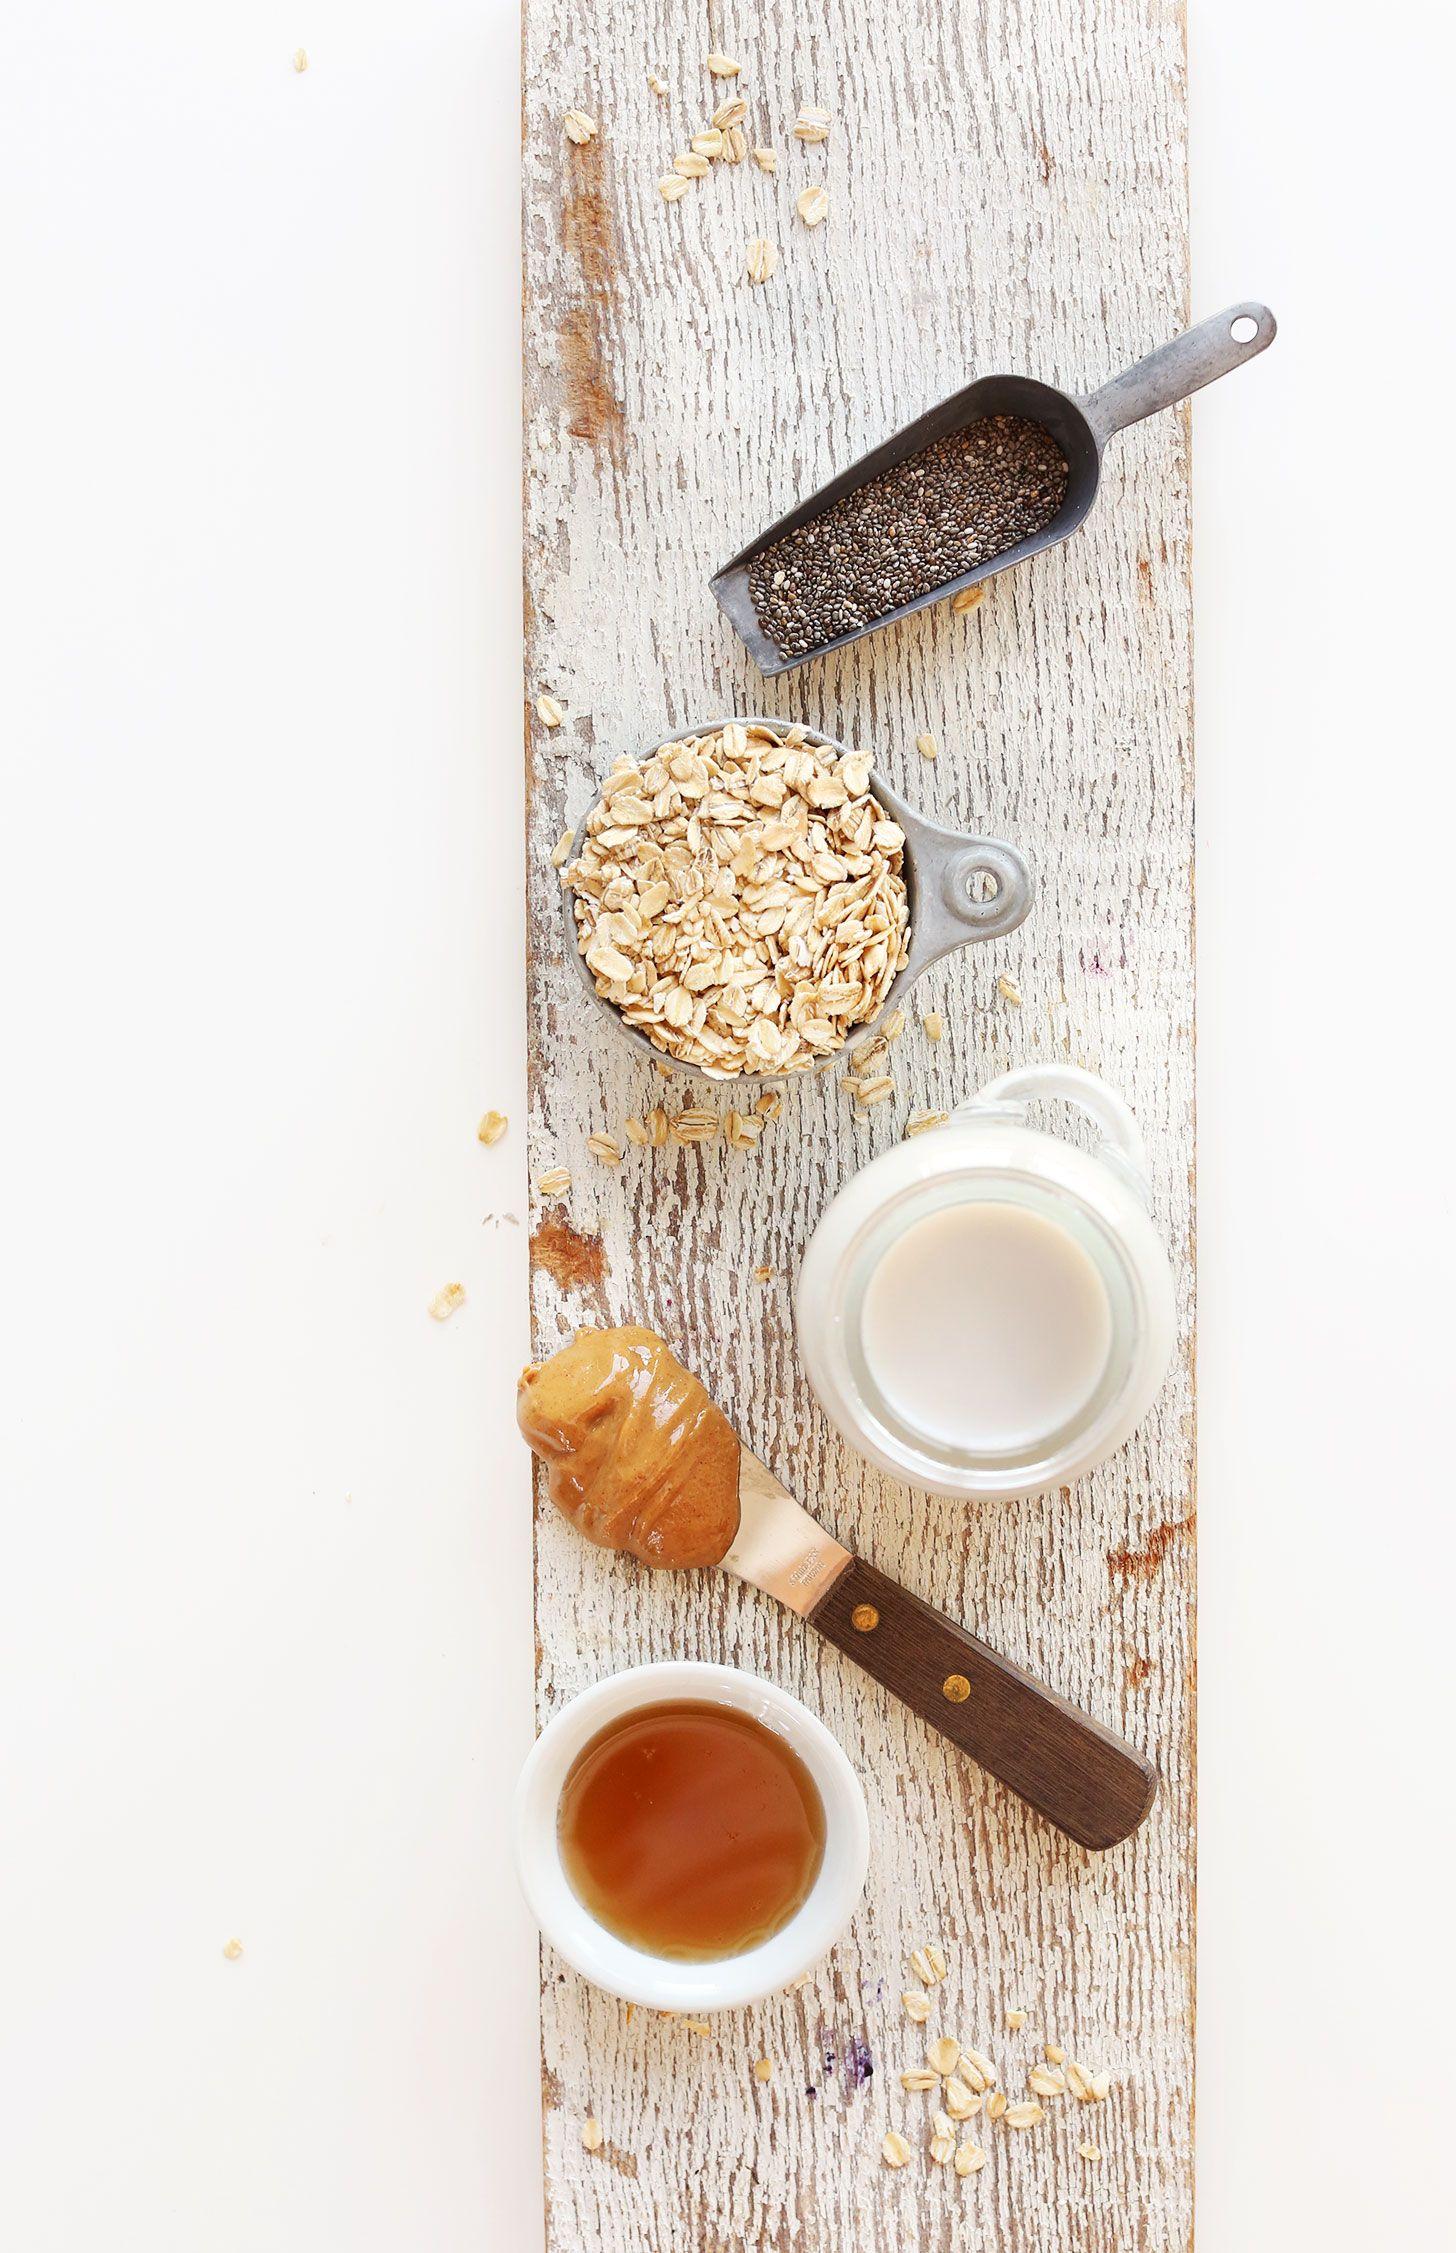 Easy Peanut Butter Overnight Oats | Minimalist #Baker #colazione #breakfast #food #slowfood #mattina #buongiorno #goodmorning #slow #slowliving #ideas #inspiration #love #follow #me #nature #ideas #slowfood #originalfood #good #beautiful  www.thelifestylejournal.it